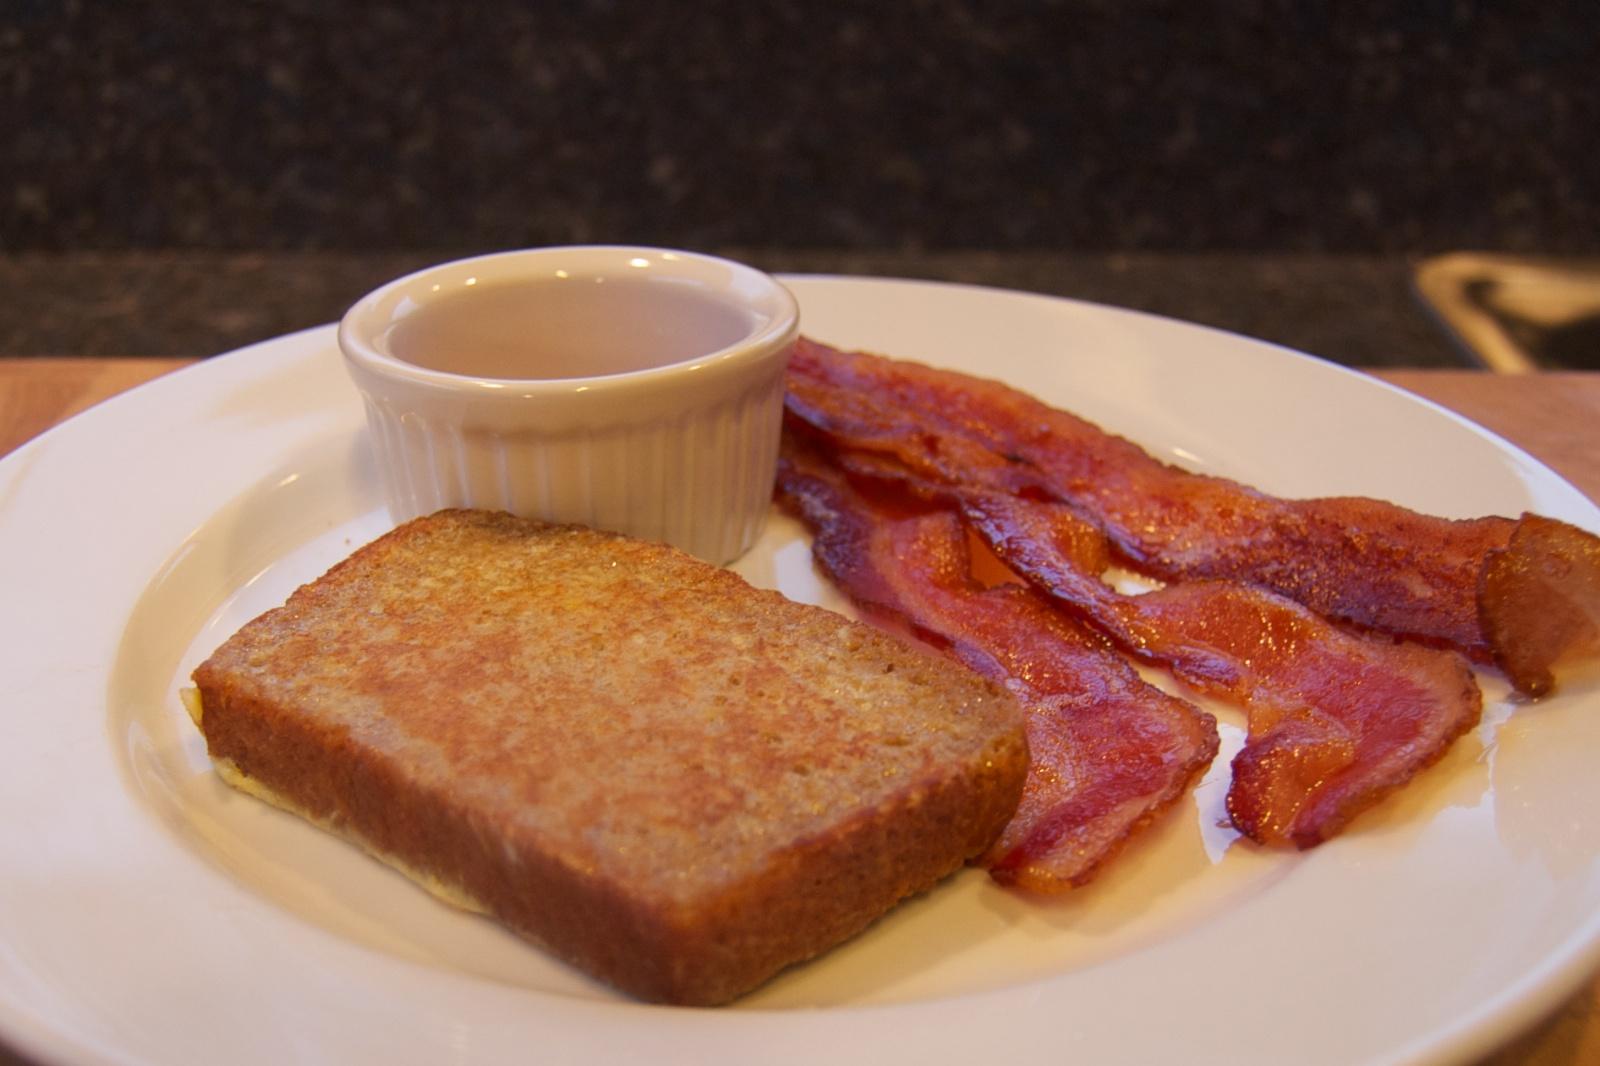 http://blog.rickk.com/food/2011/10/21/ate.2011.10.21.b.jpg